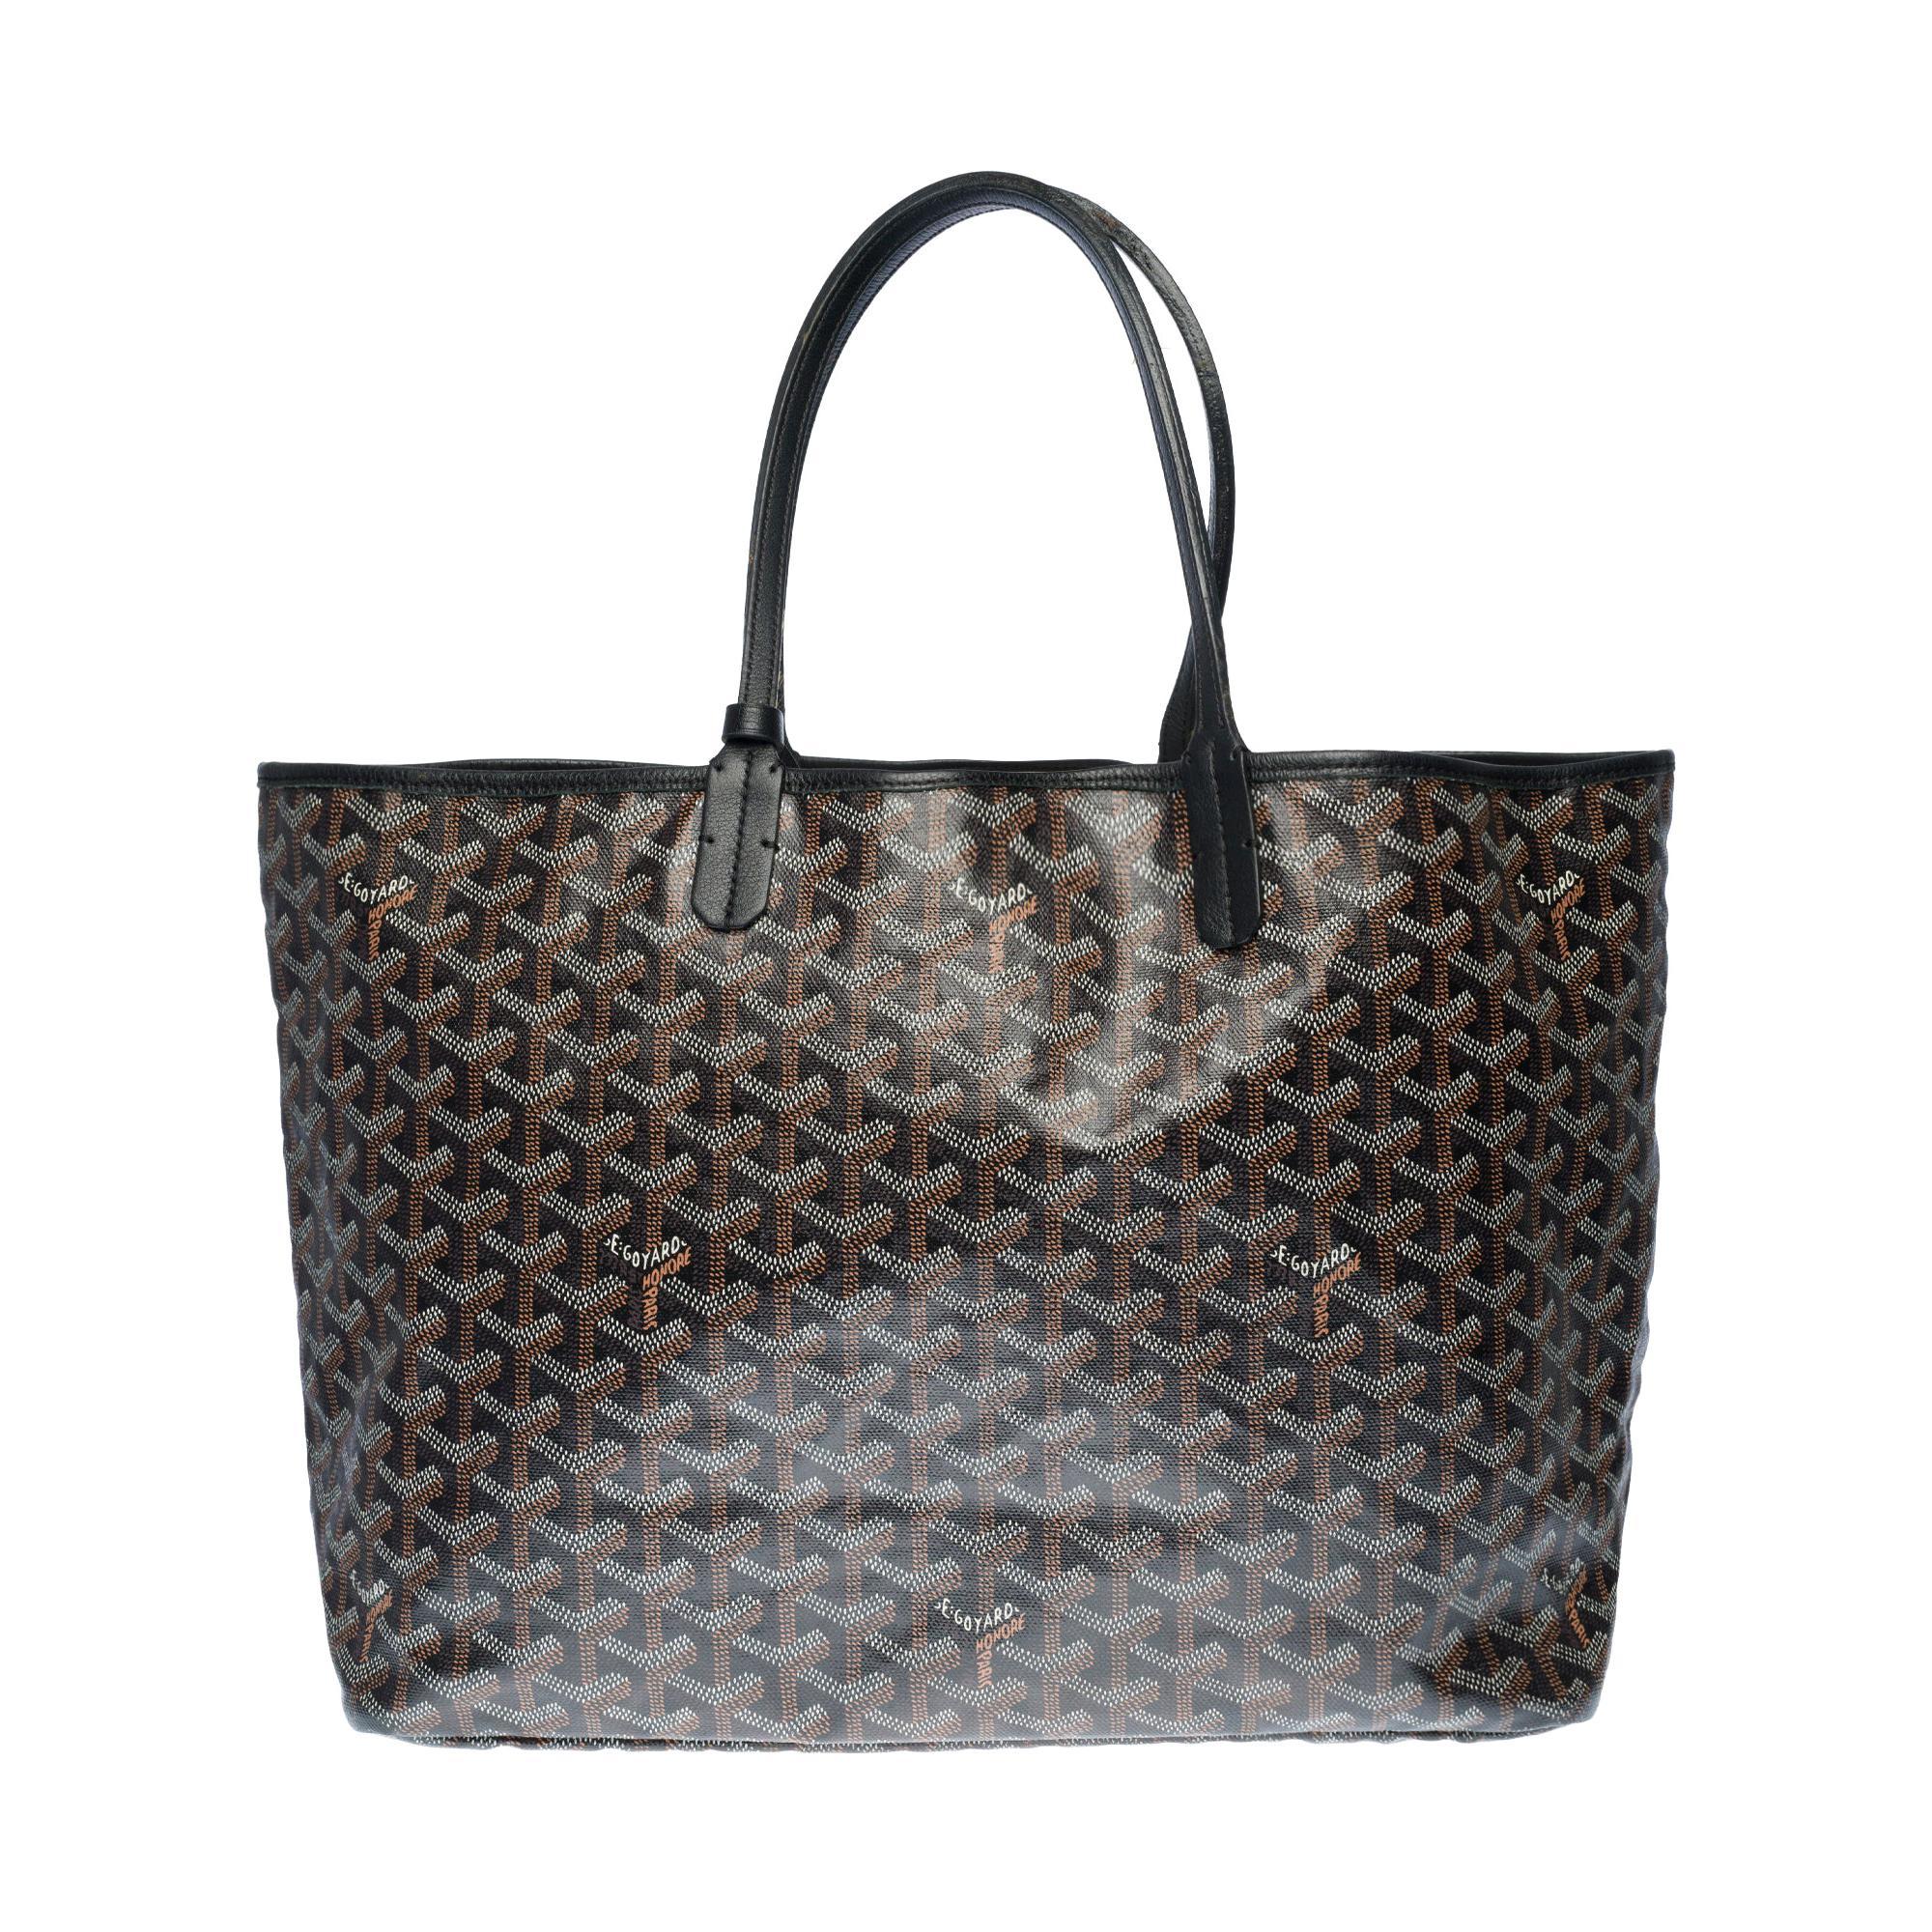 The Coveted Goyard Saint-Louis Tote bag in black Goyardine canvas